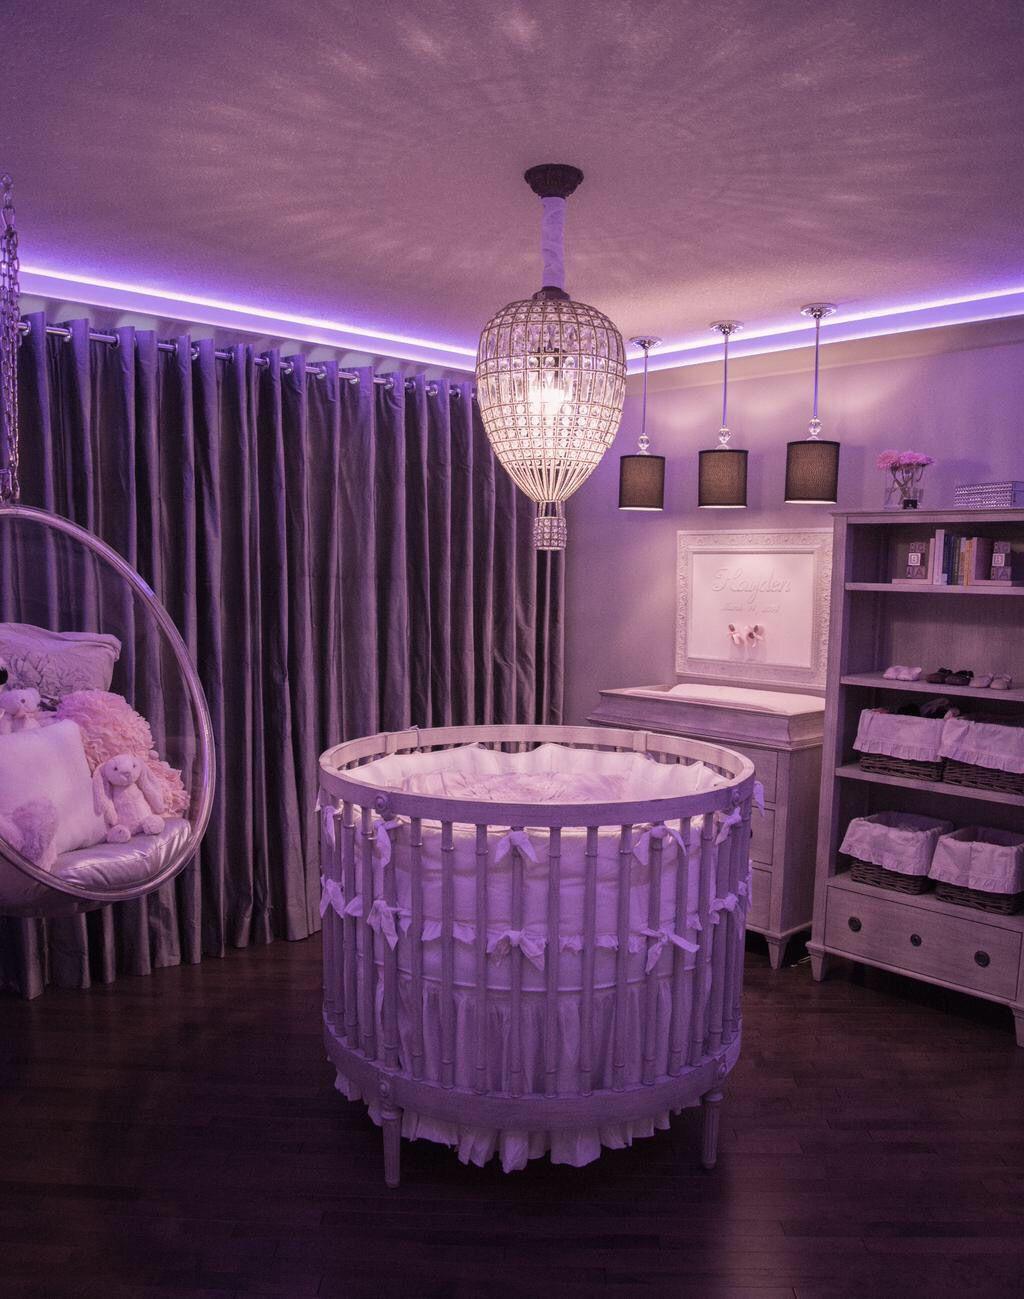 Design Round Cribs baby nursery round crib swing pink uplighting custom room room